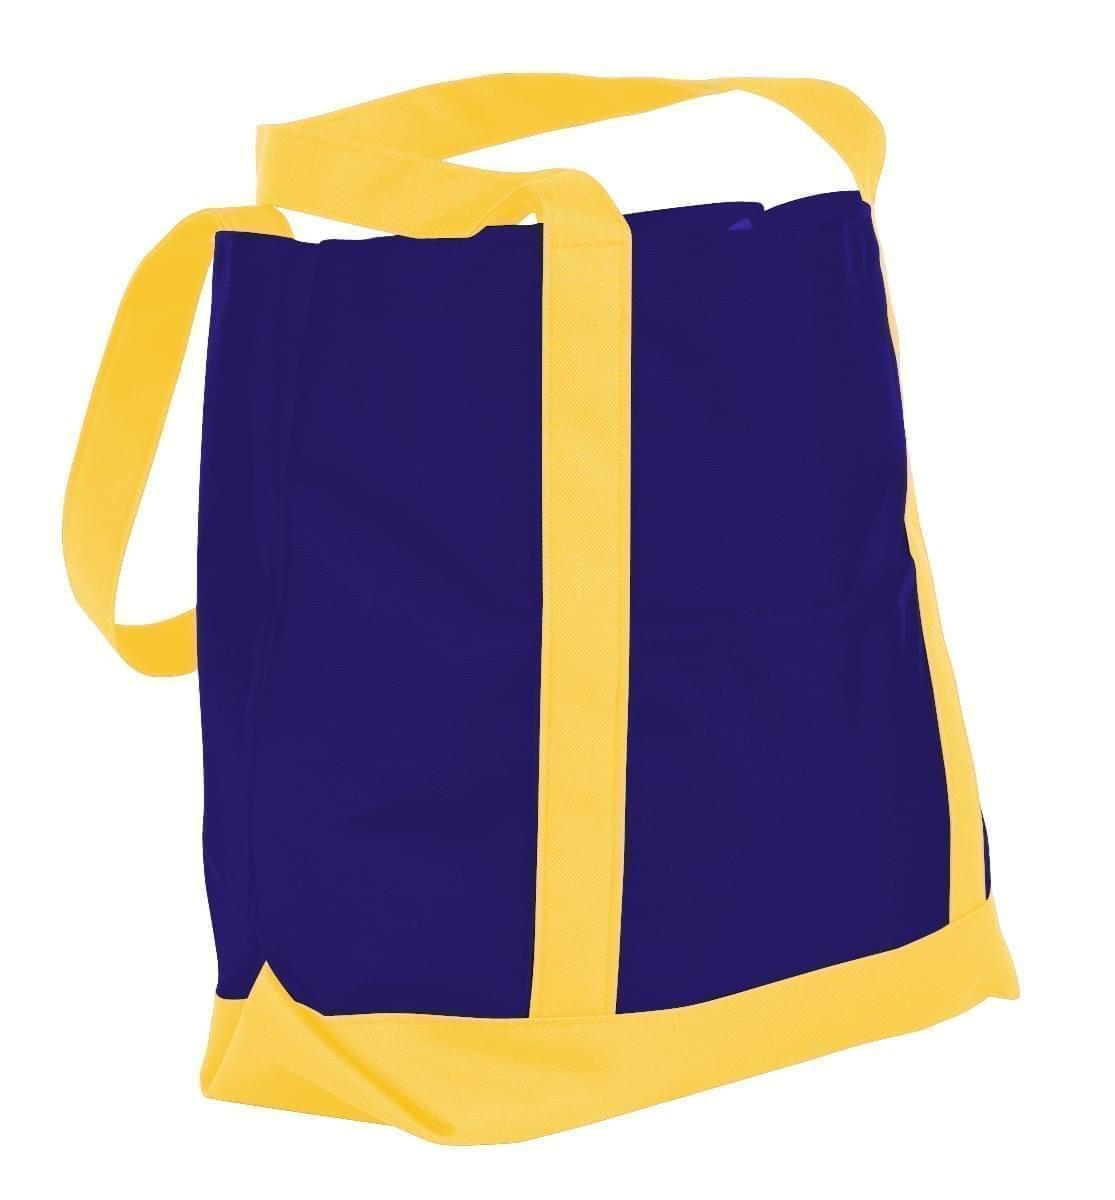 USA Made Nylon Poly Boat Tote Bags, Purple-Gold, XAACL1UAYQ